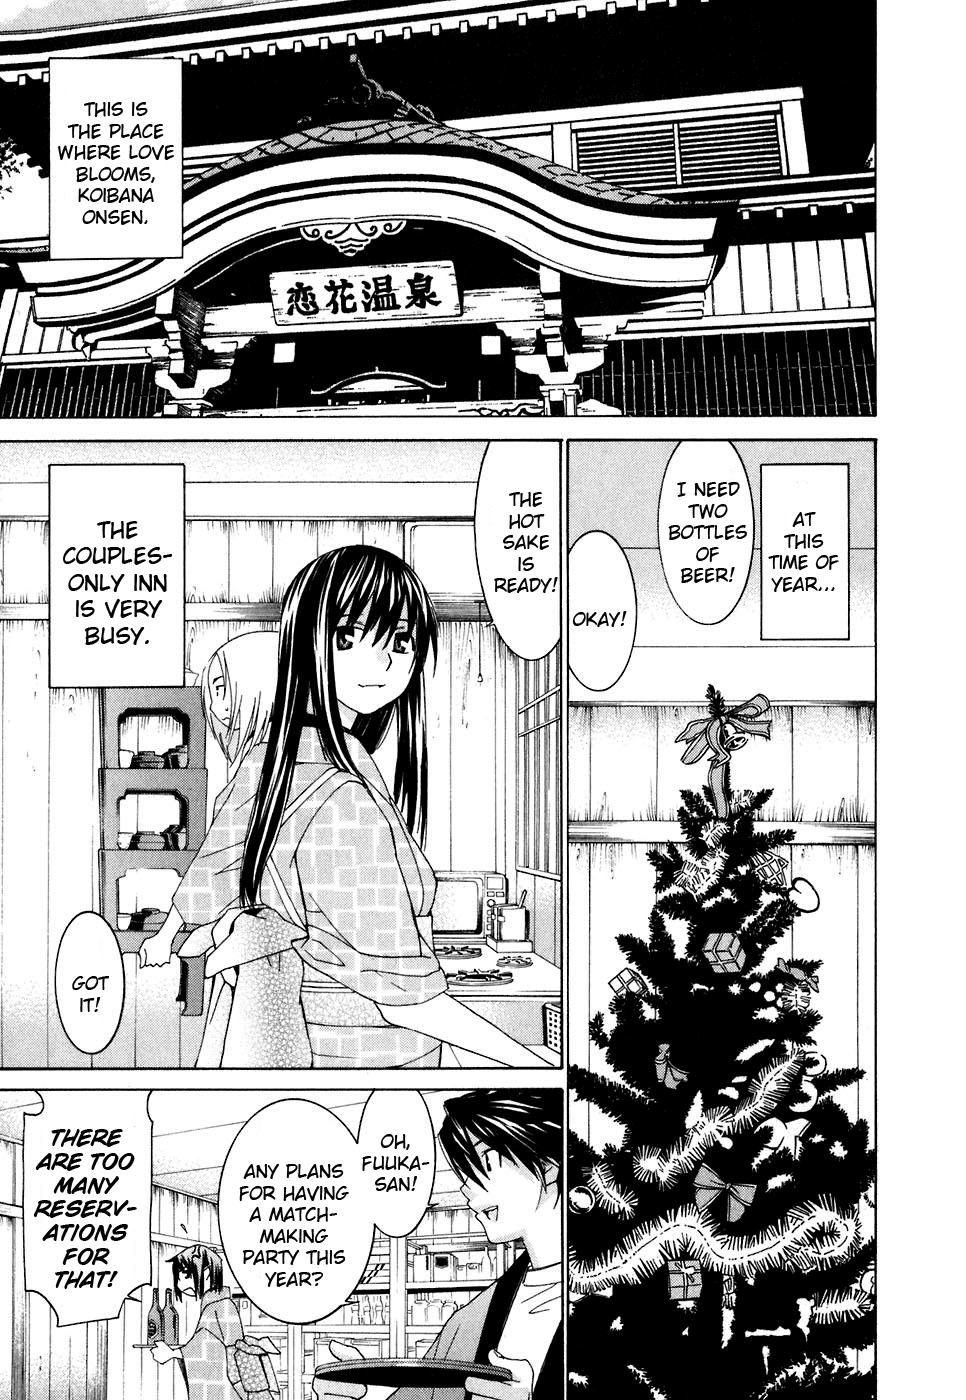 koibana onsen